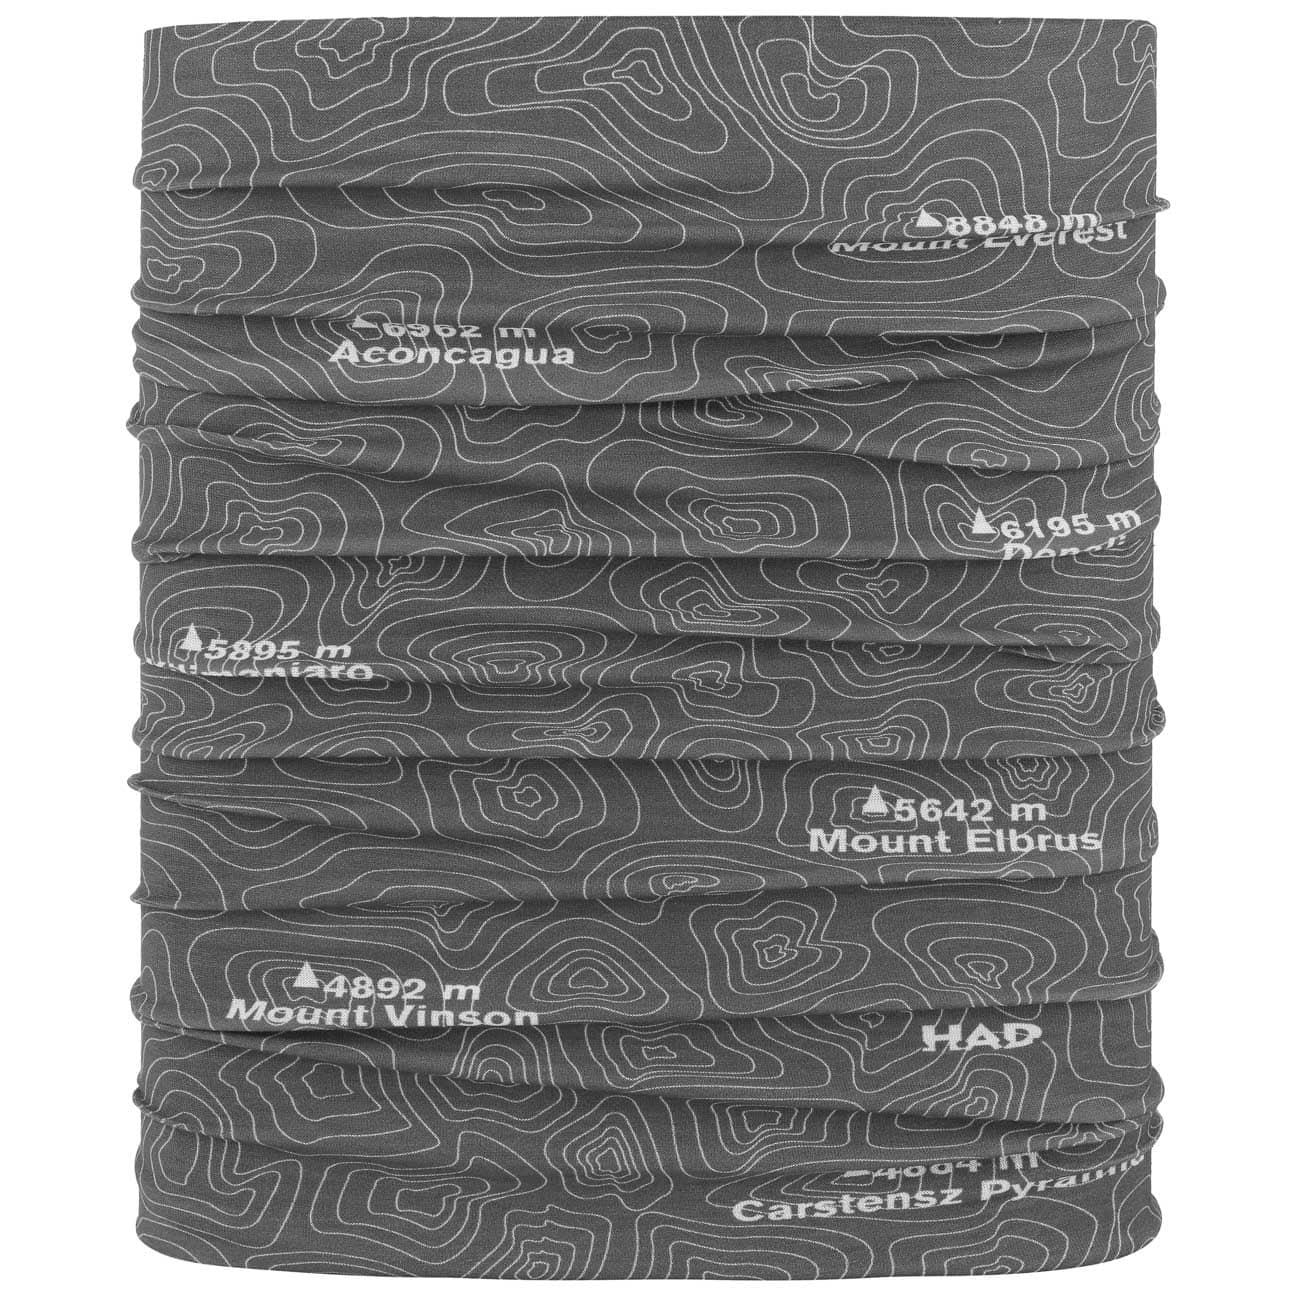 Bandana Multifuncional 7SMTS by H.A.D.  cinta para la cabeza